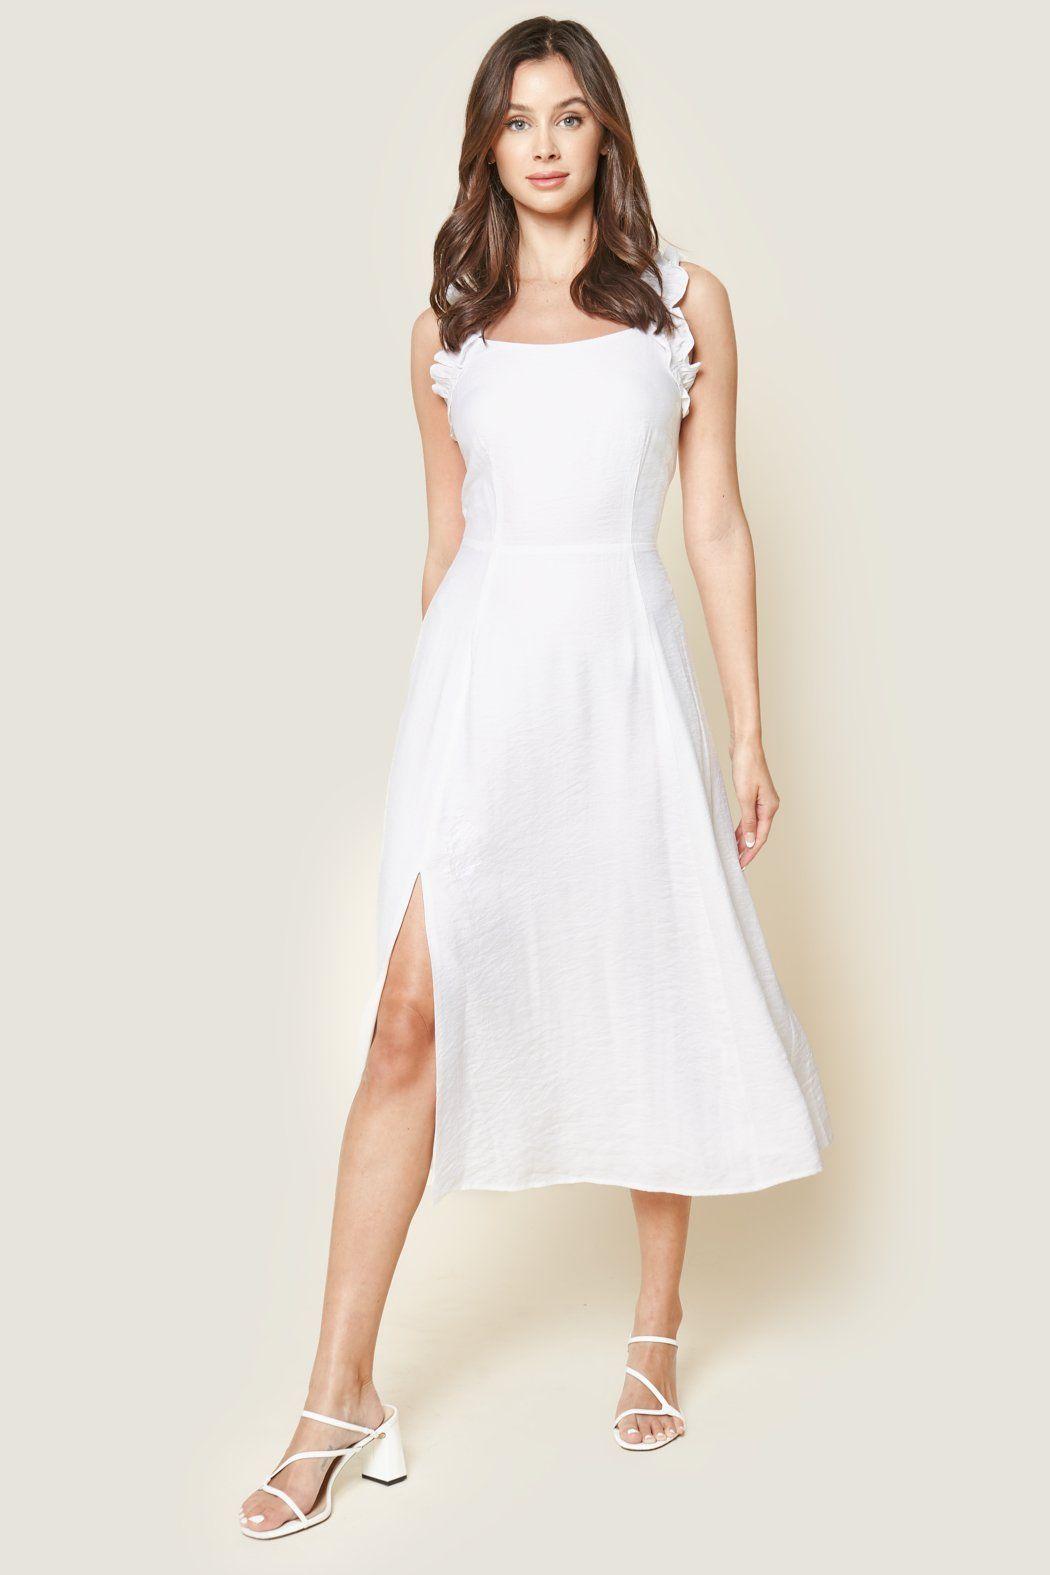 Angelic Ruffled Midi Dress In 2021 White Dresses Graduation White Summer Midi Dress Midi Ruffle Dress [ 1575 x 1050 Pixel ]